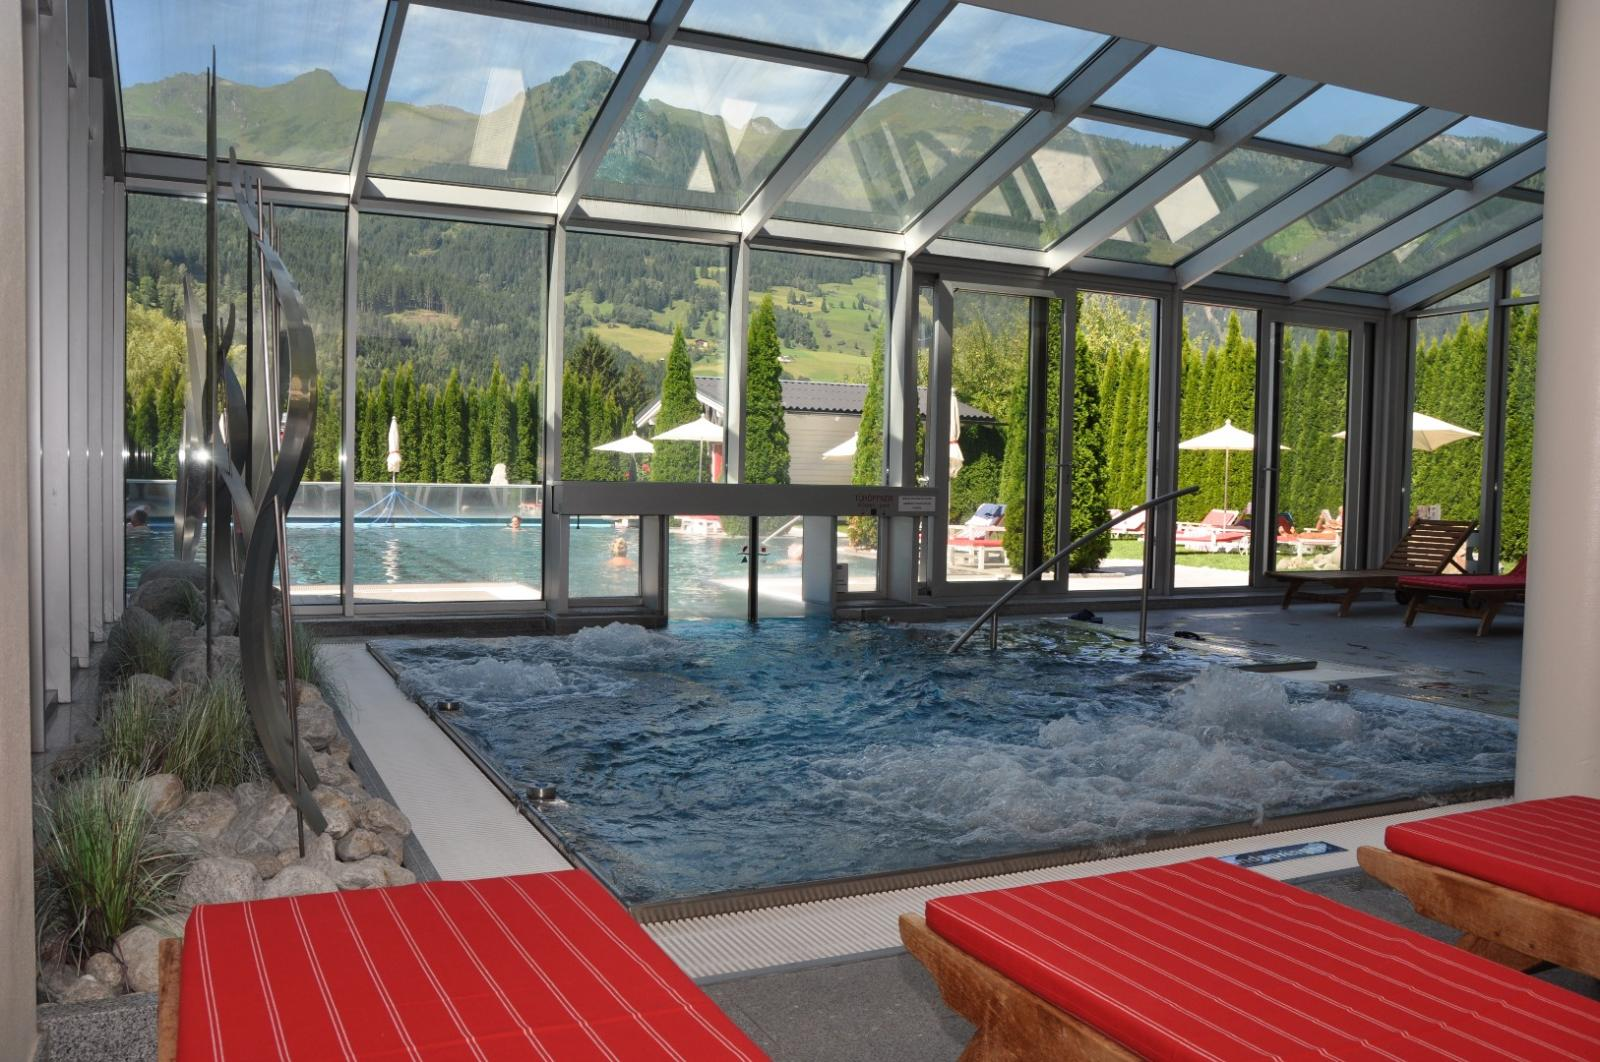 Hydrojet: Foto vom Wellnesshotel Impuls Hotel Tirol | Wellness Salzburger Land